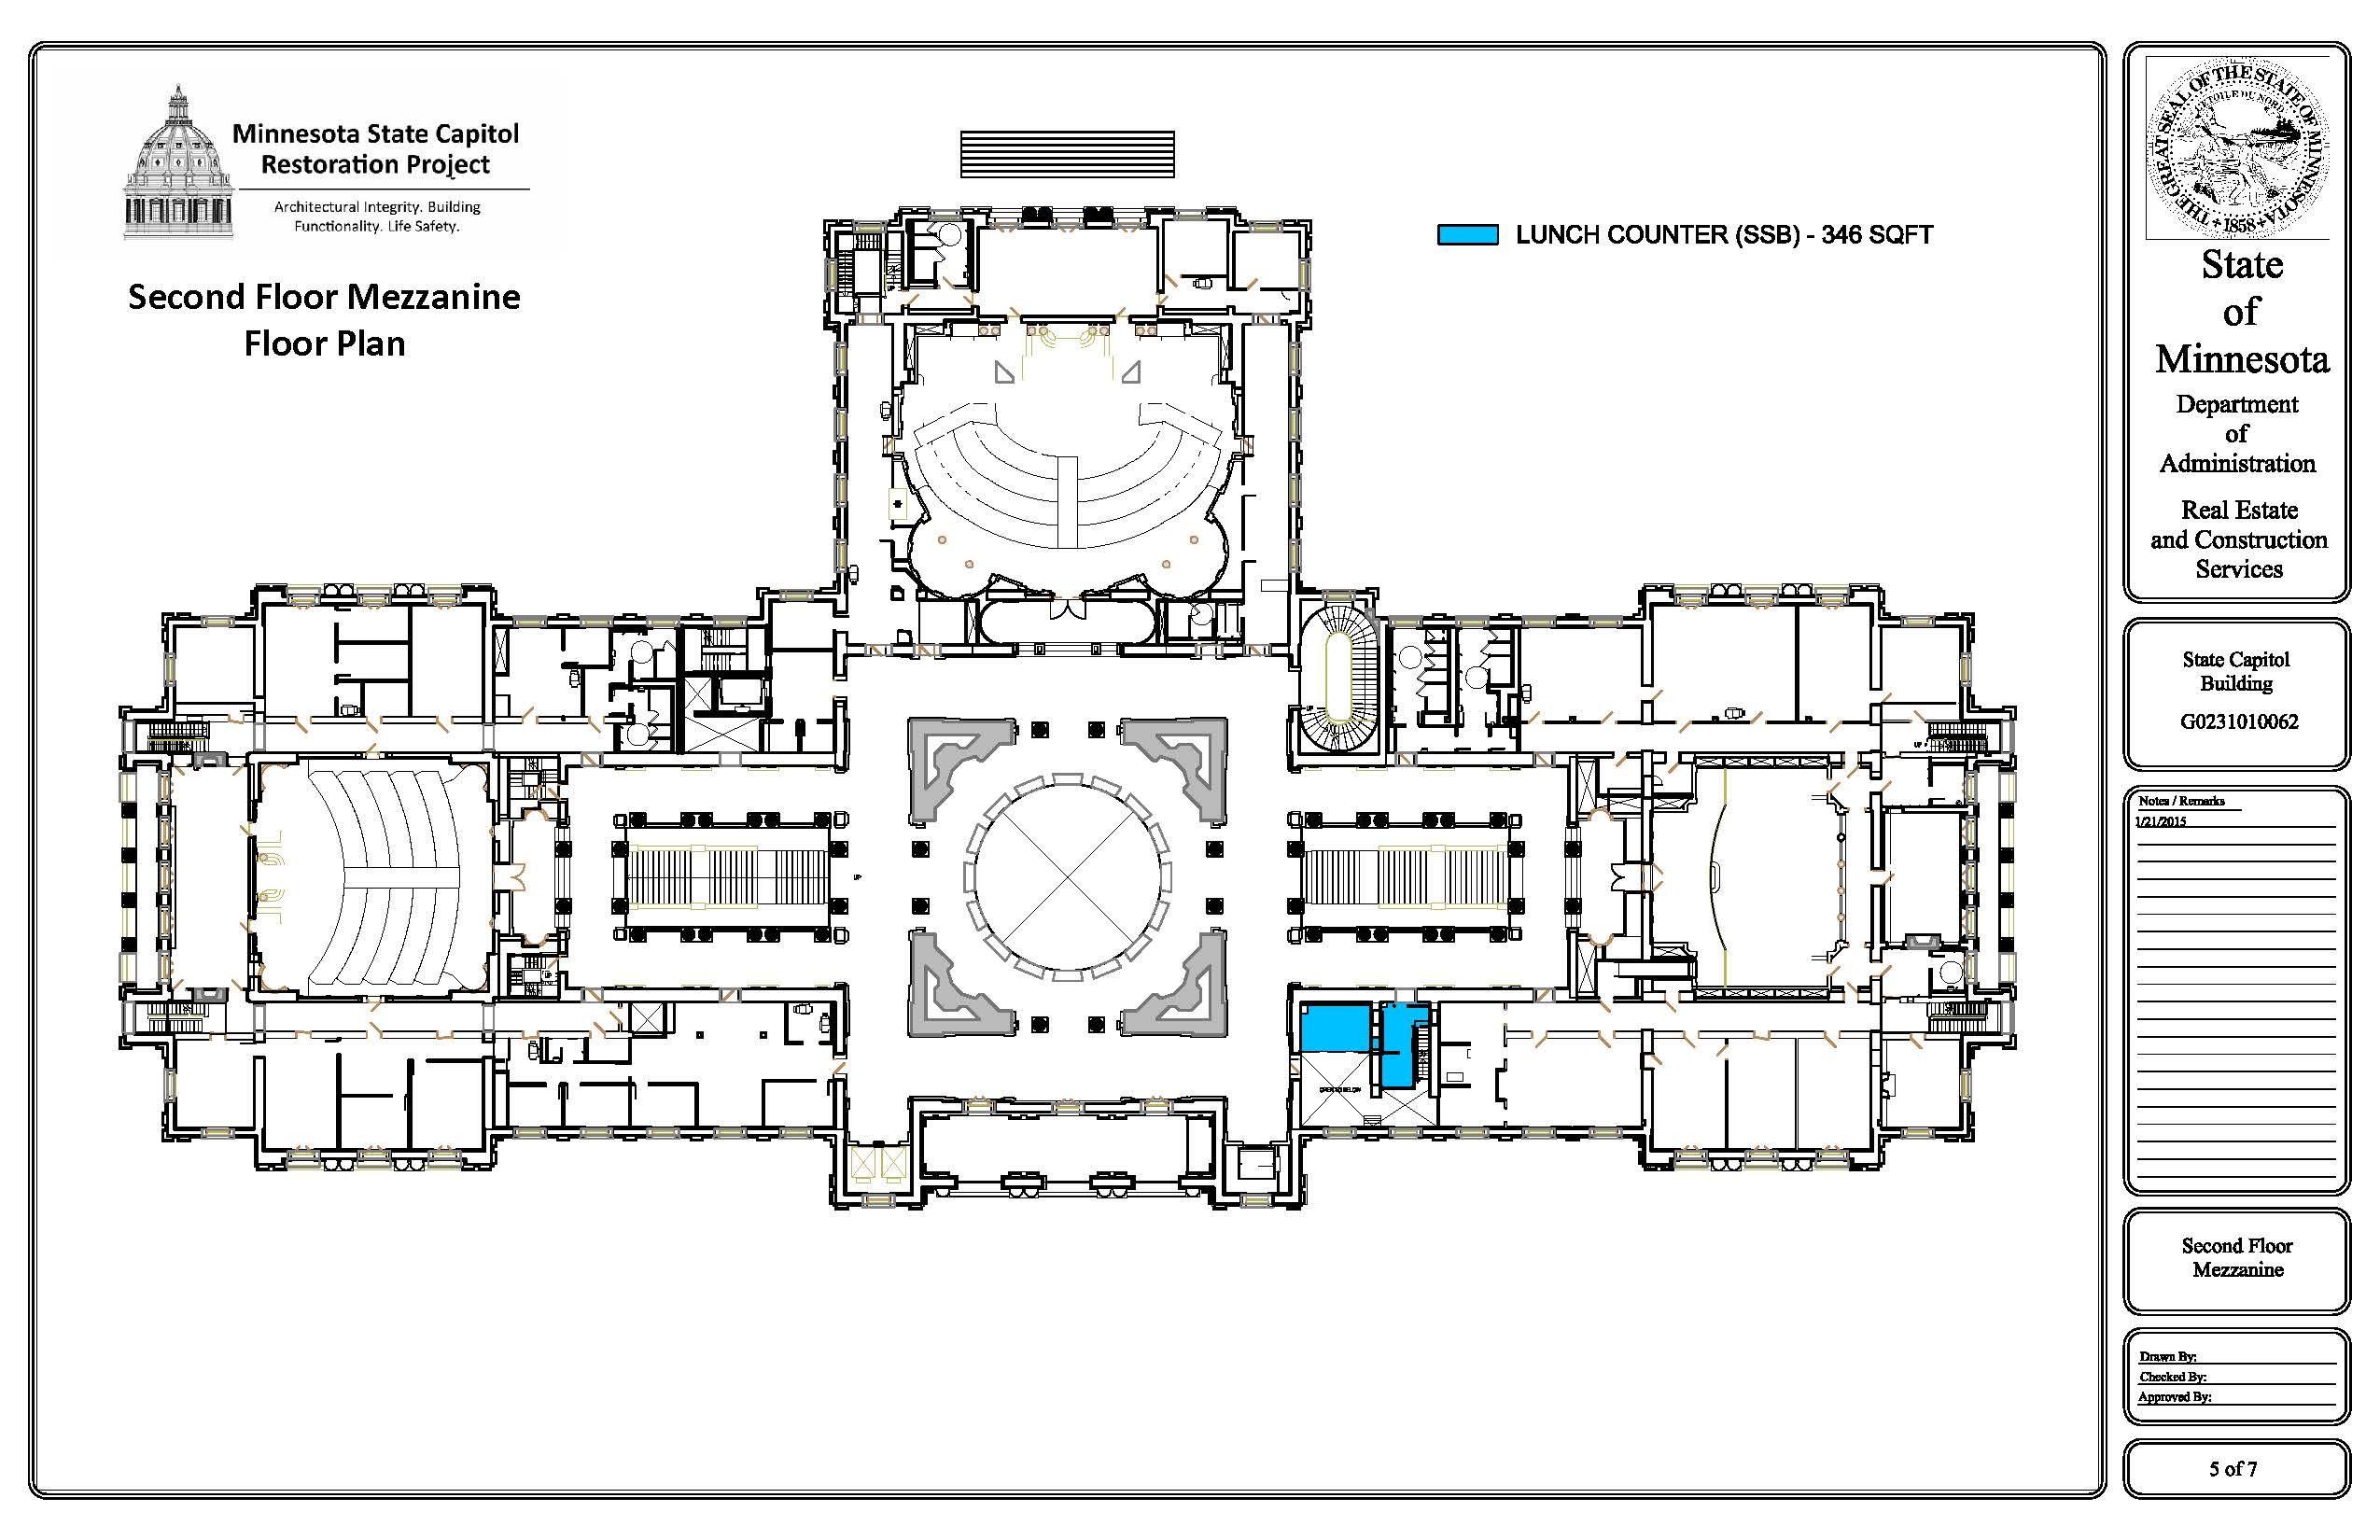 2015 Minnesota State Capitol Second Floor Mezzanine Future Occupancy Plan 2550 1650 Floor Plan Generator Farmhouse Floor Plans Floor Plans